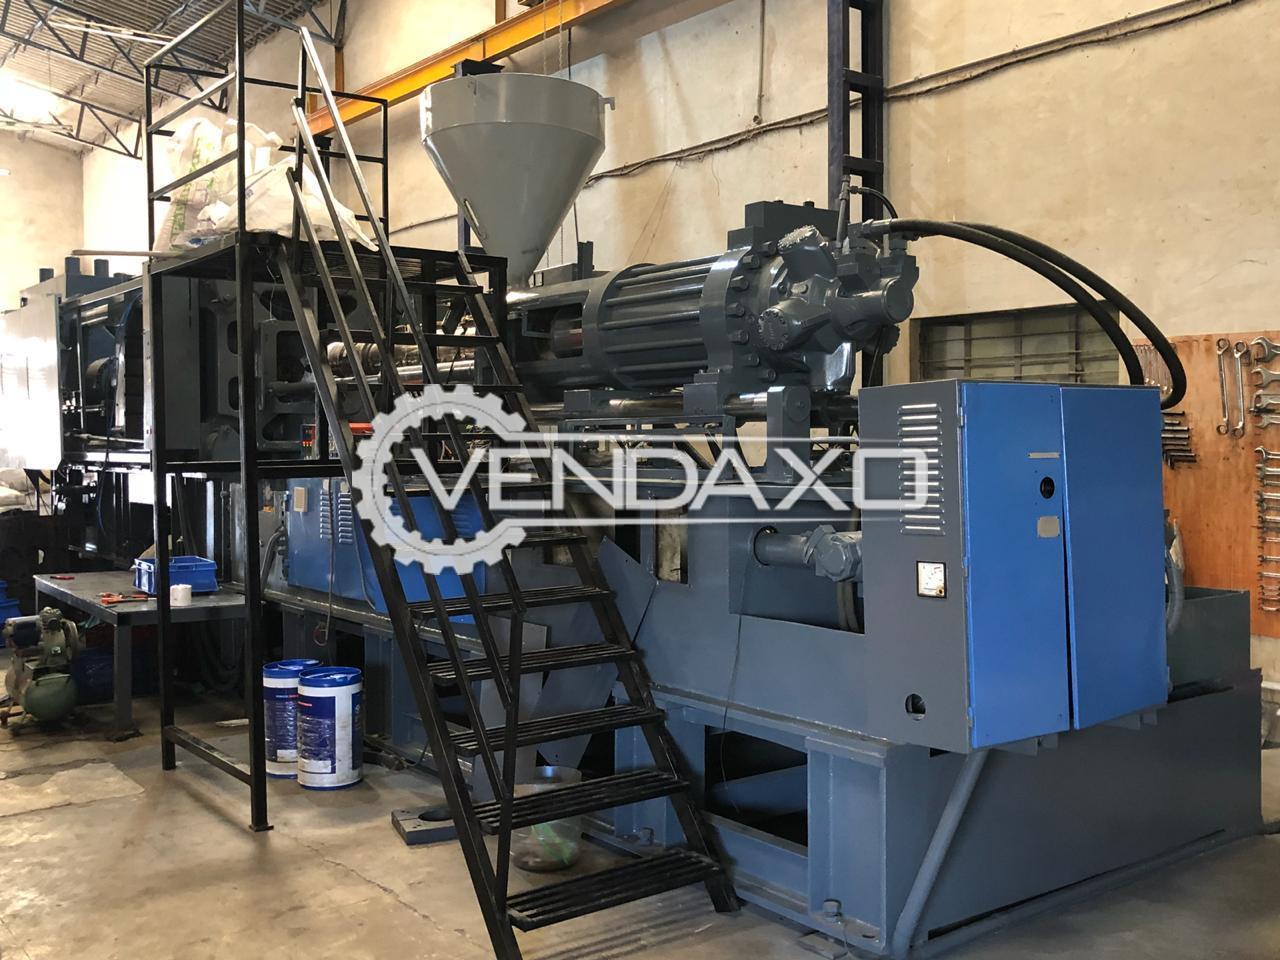 Windsor SPH-650 Injection Moulding Machine - Screw Diameter - 110 mm